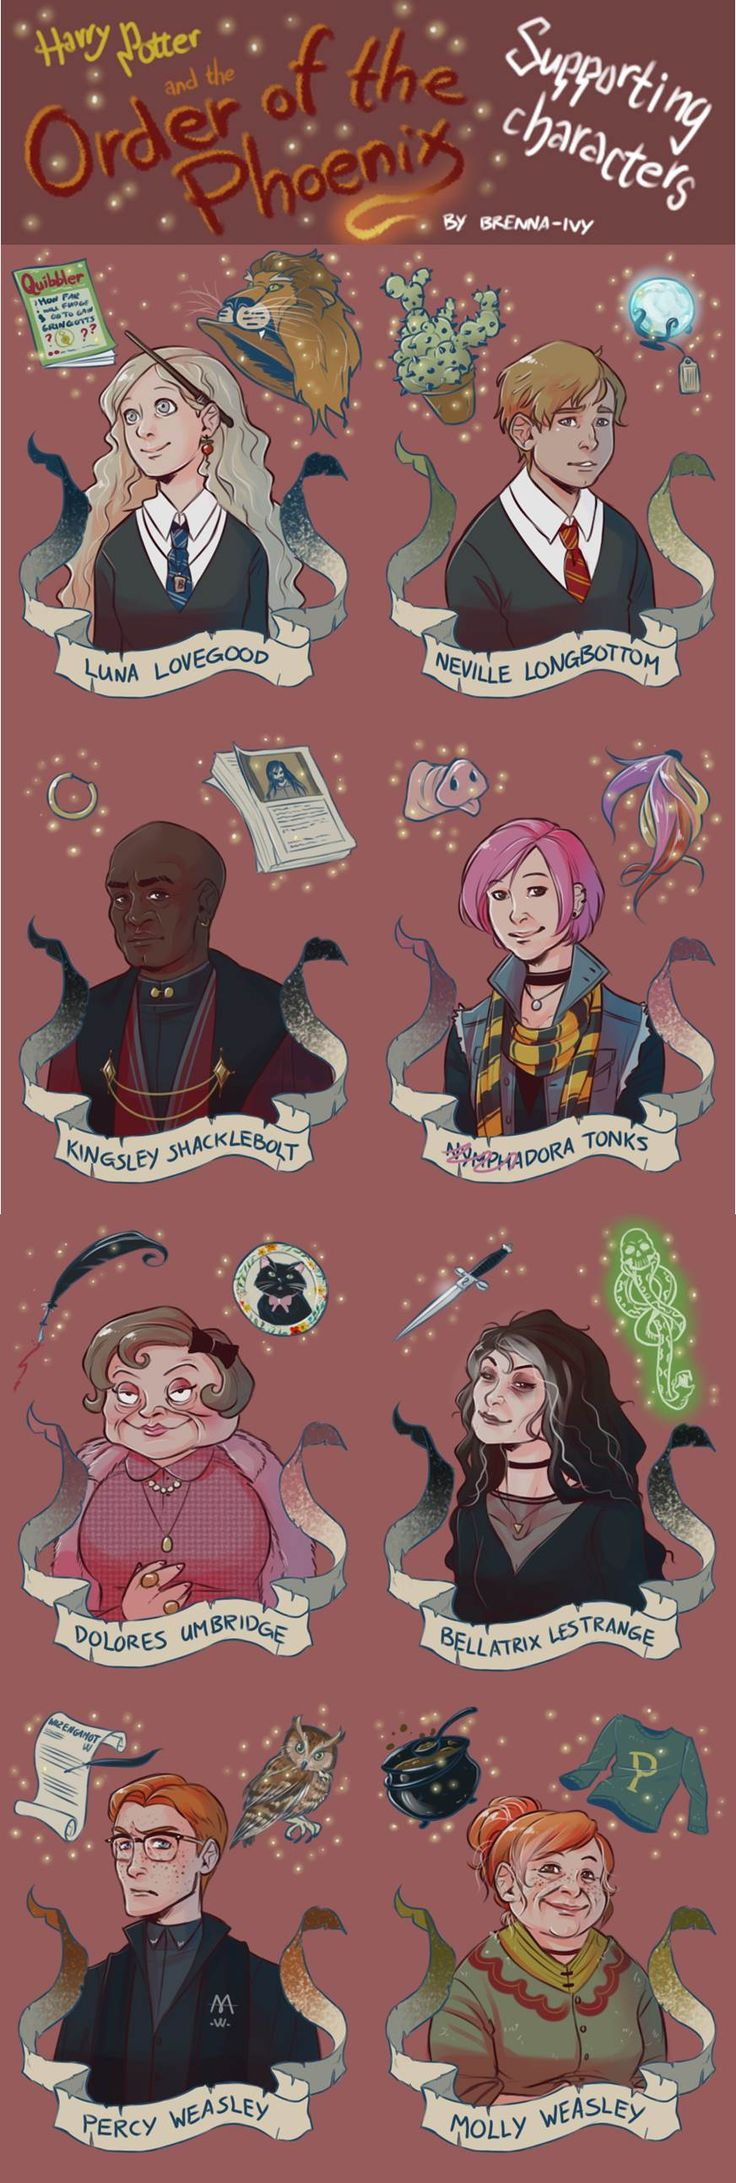 Harry Potter - Luna, Neville, Shacklebolt, Tonks, Umbridge, Bellatrix, Percy and Molly